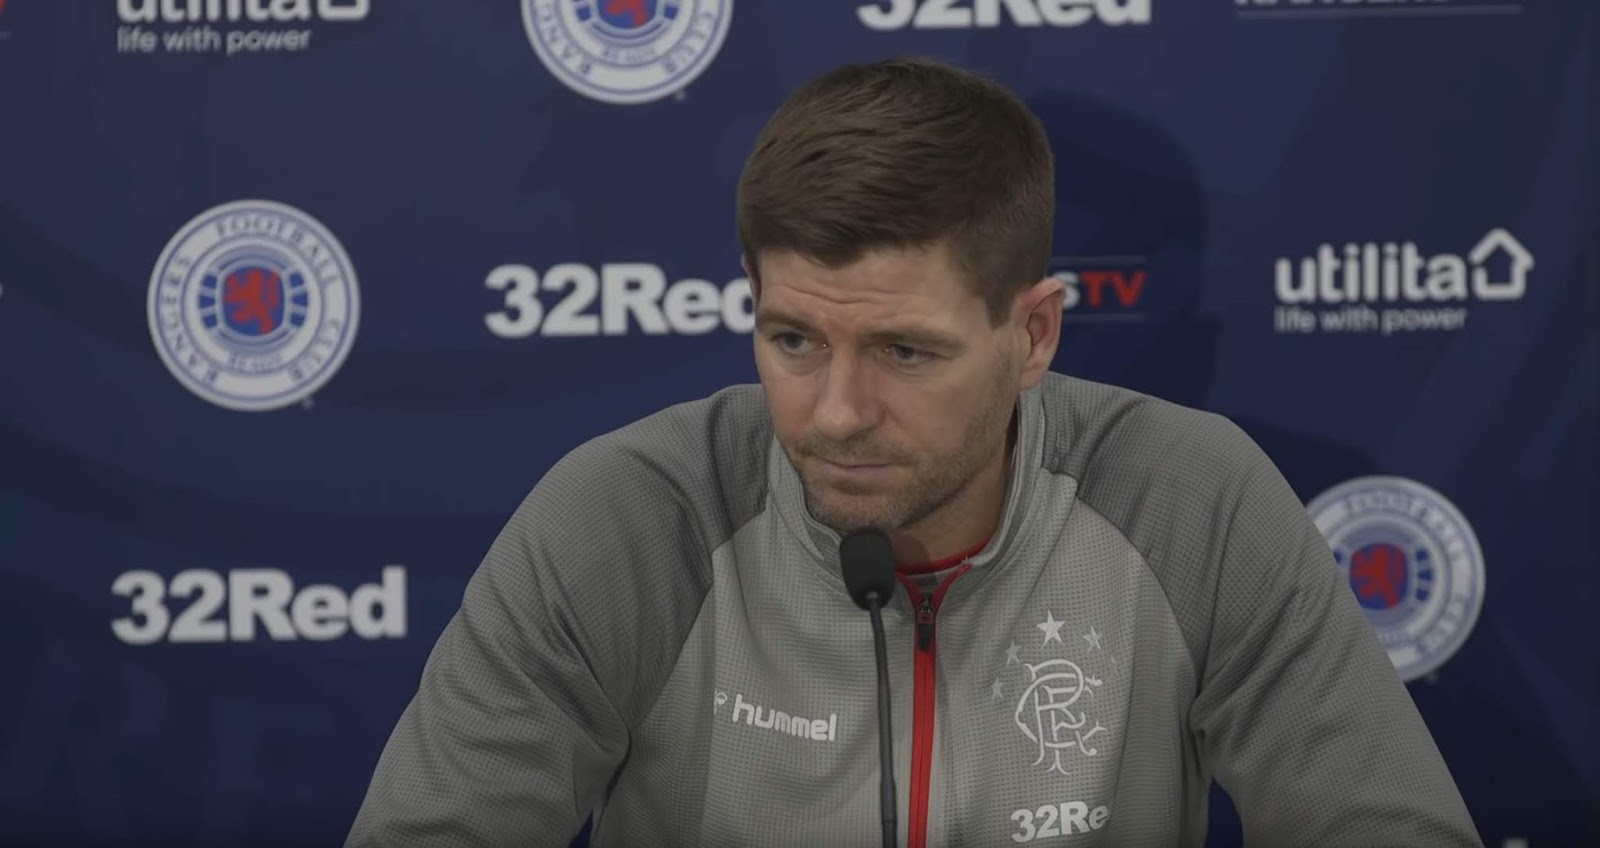 Steven Gerrard 'reveals' position on Barisic, Goldson and Morelos